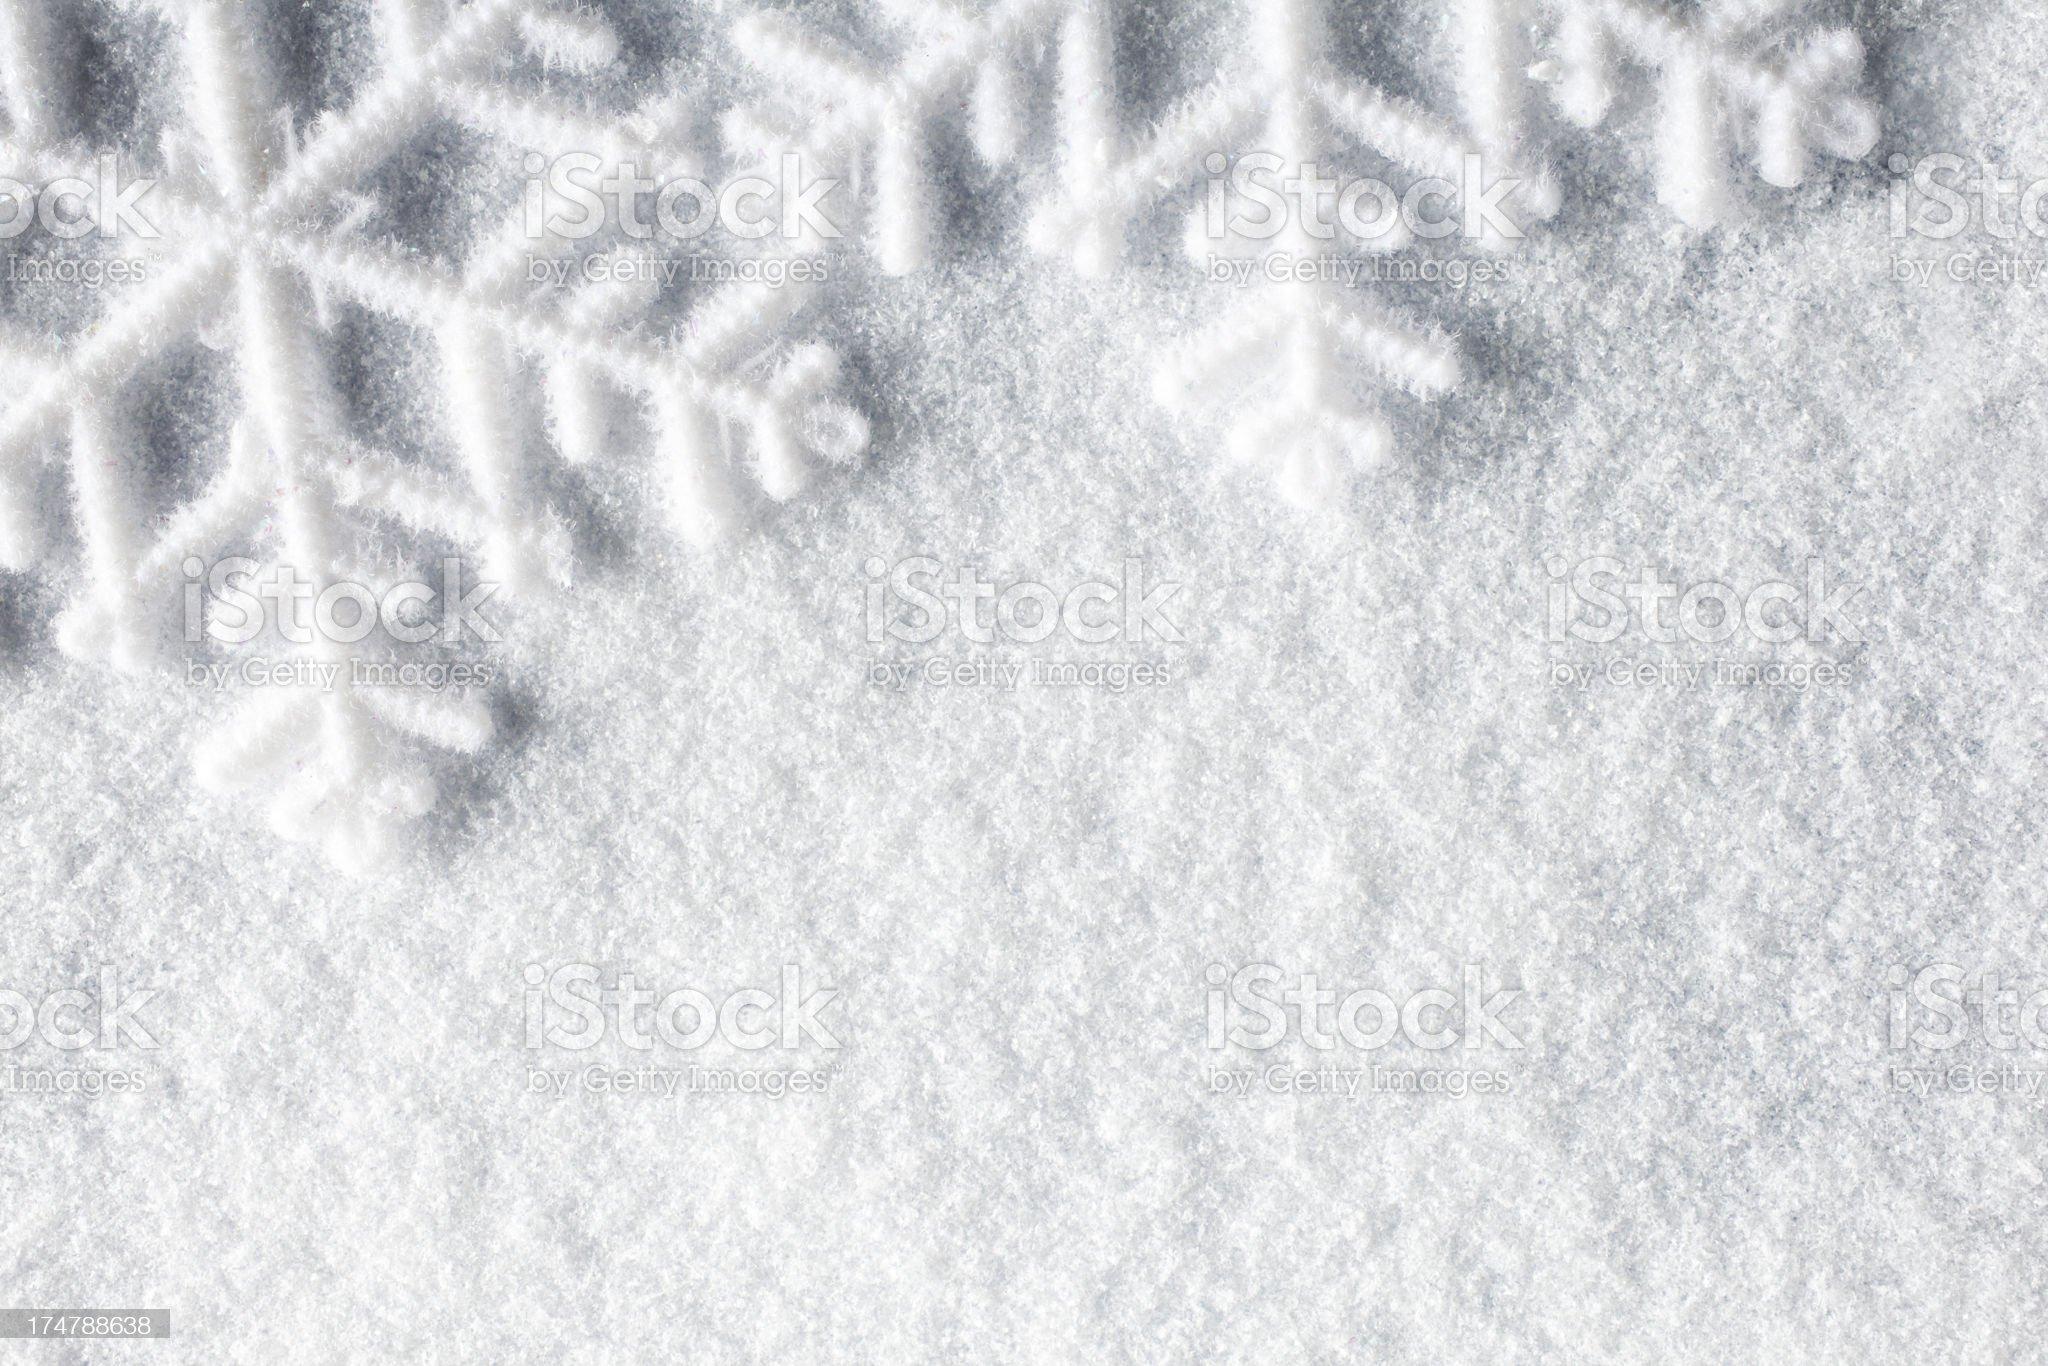 Snowflakes - Snow Macro Winter Christmas Background royalty-free stock photo